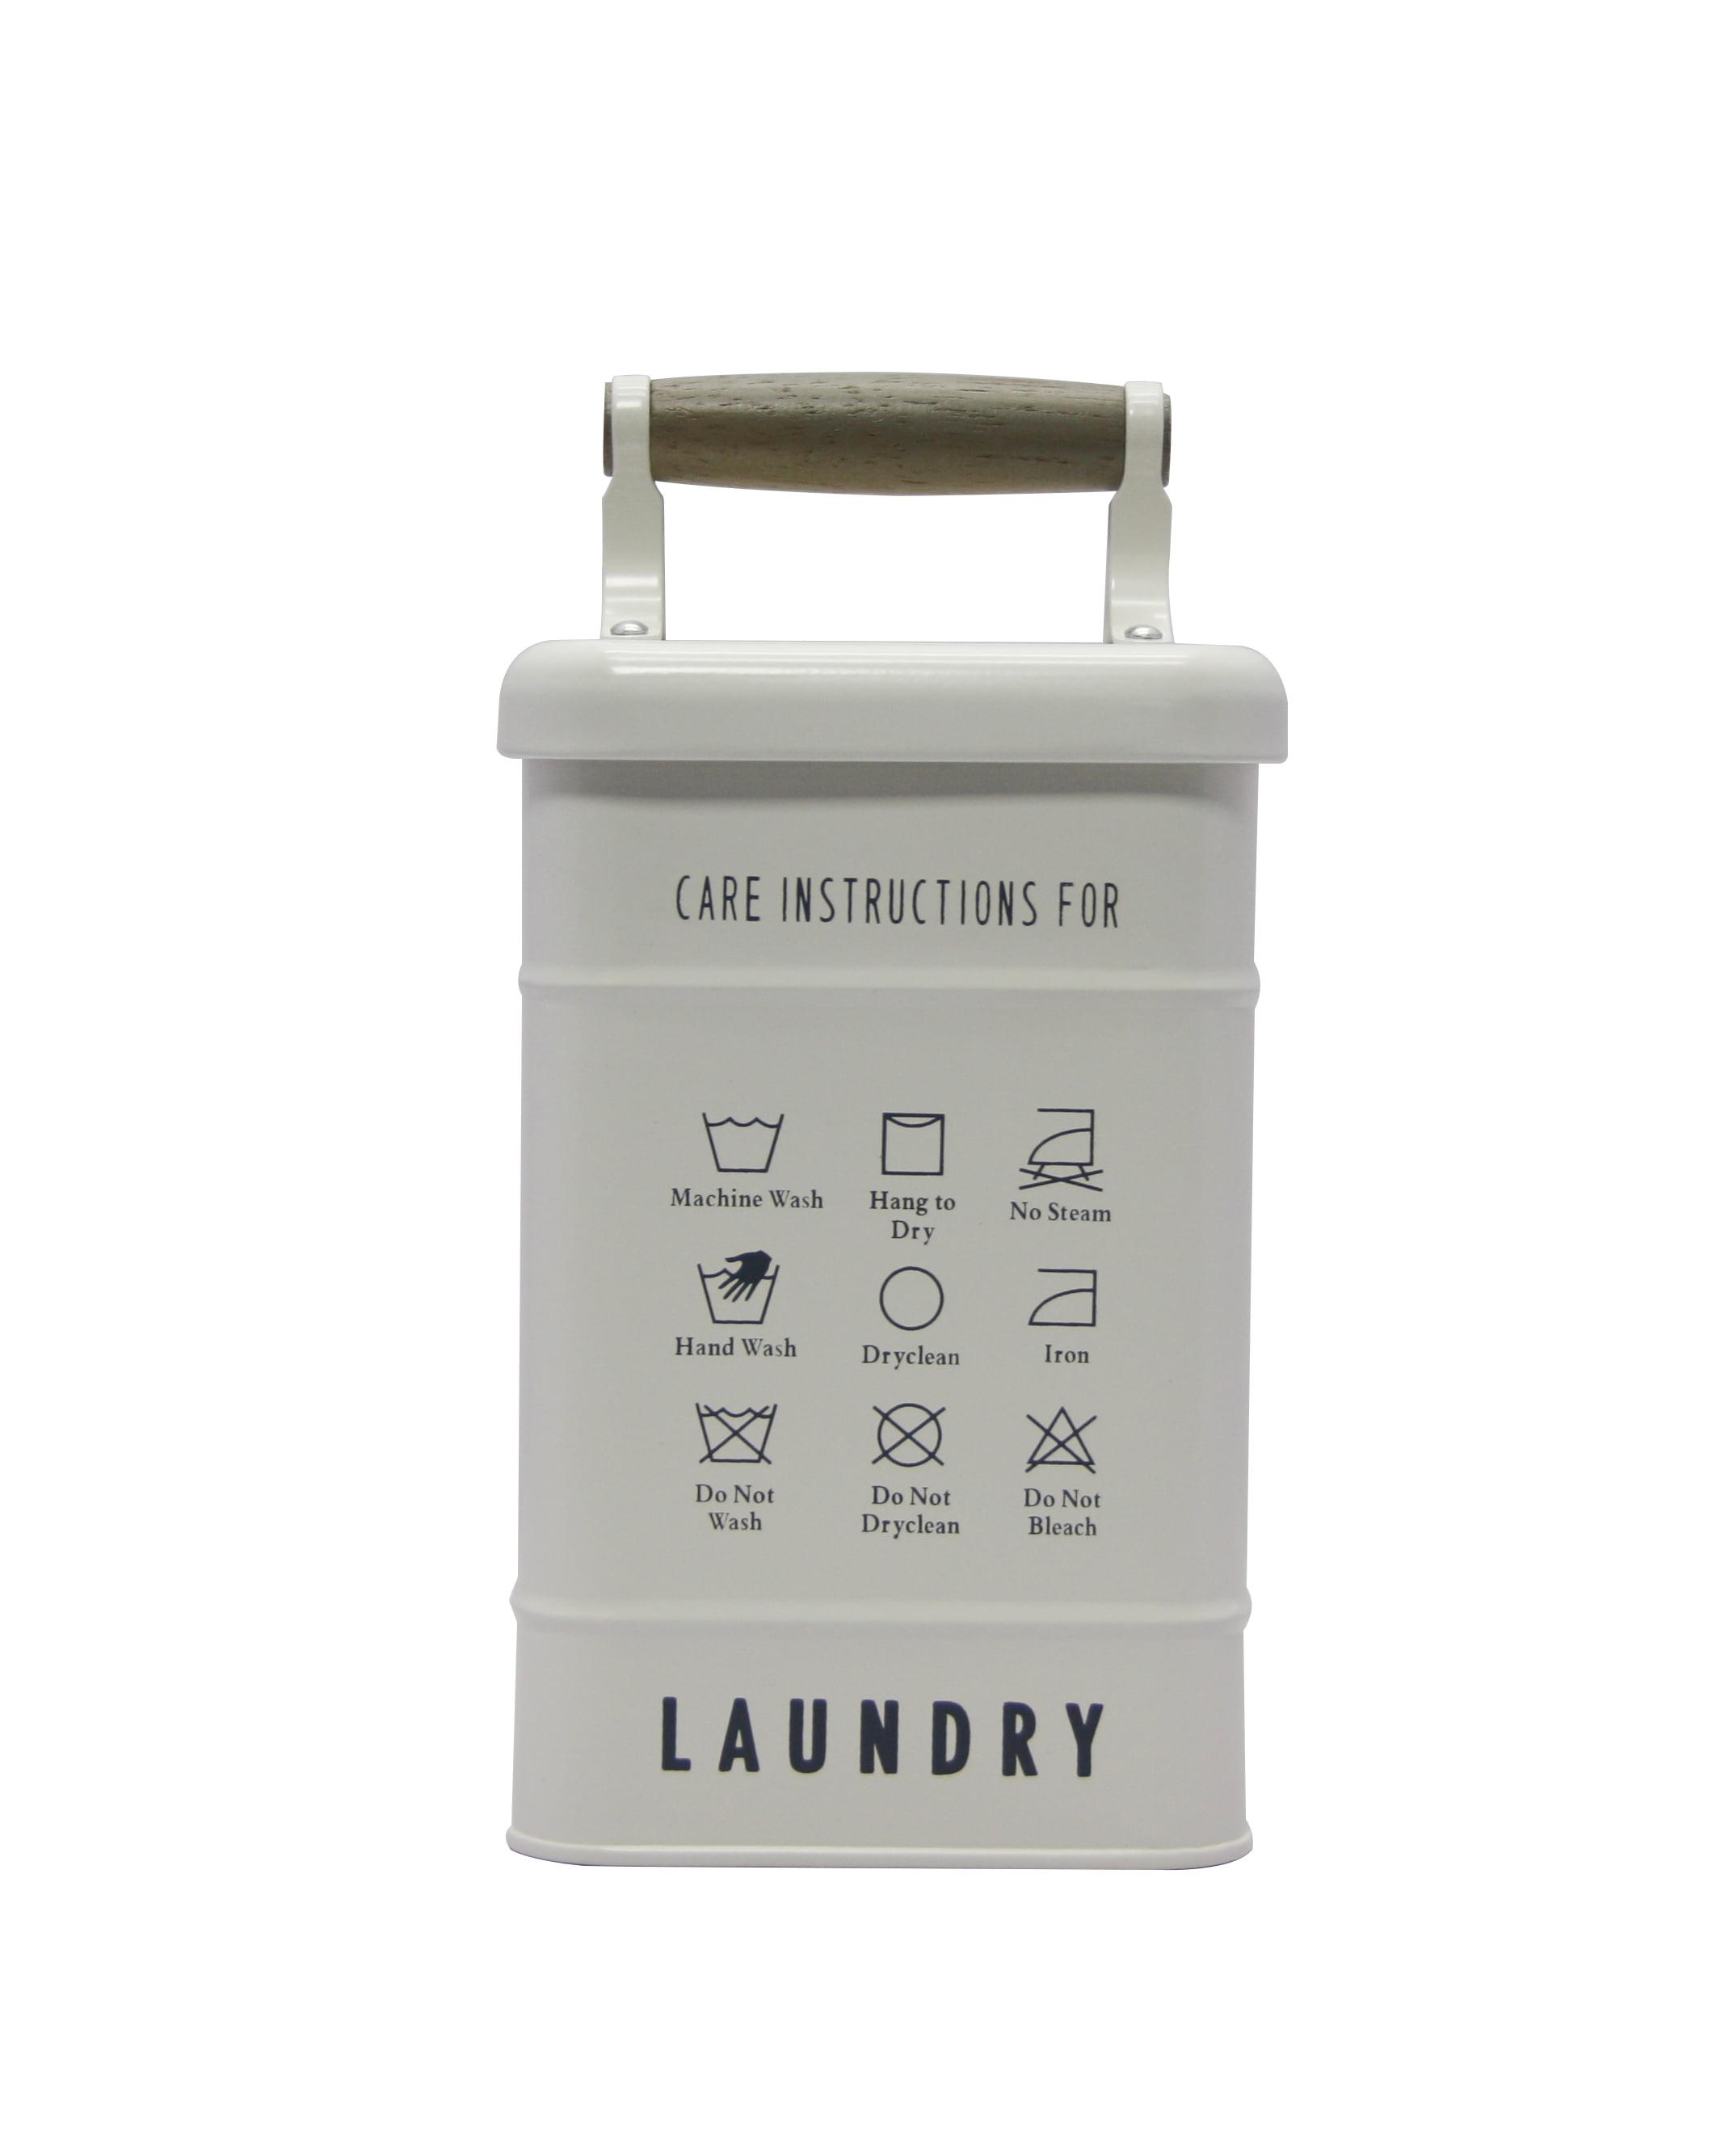 Shop Better Homes & Gardens Small Laundry Detergent Holder from Walmart on Openhaus